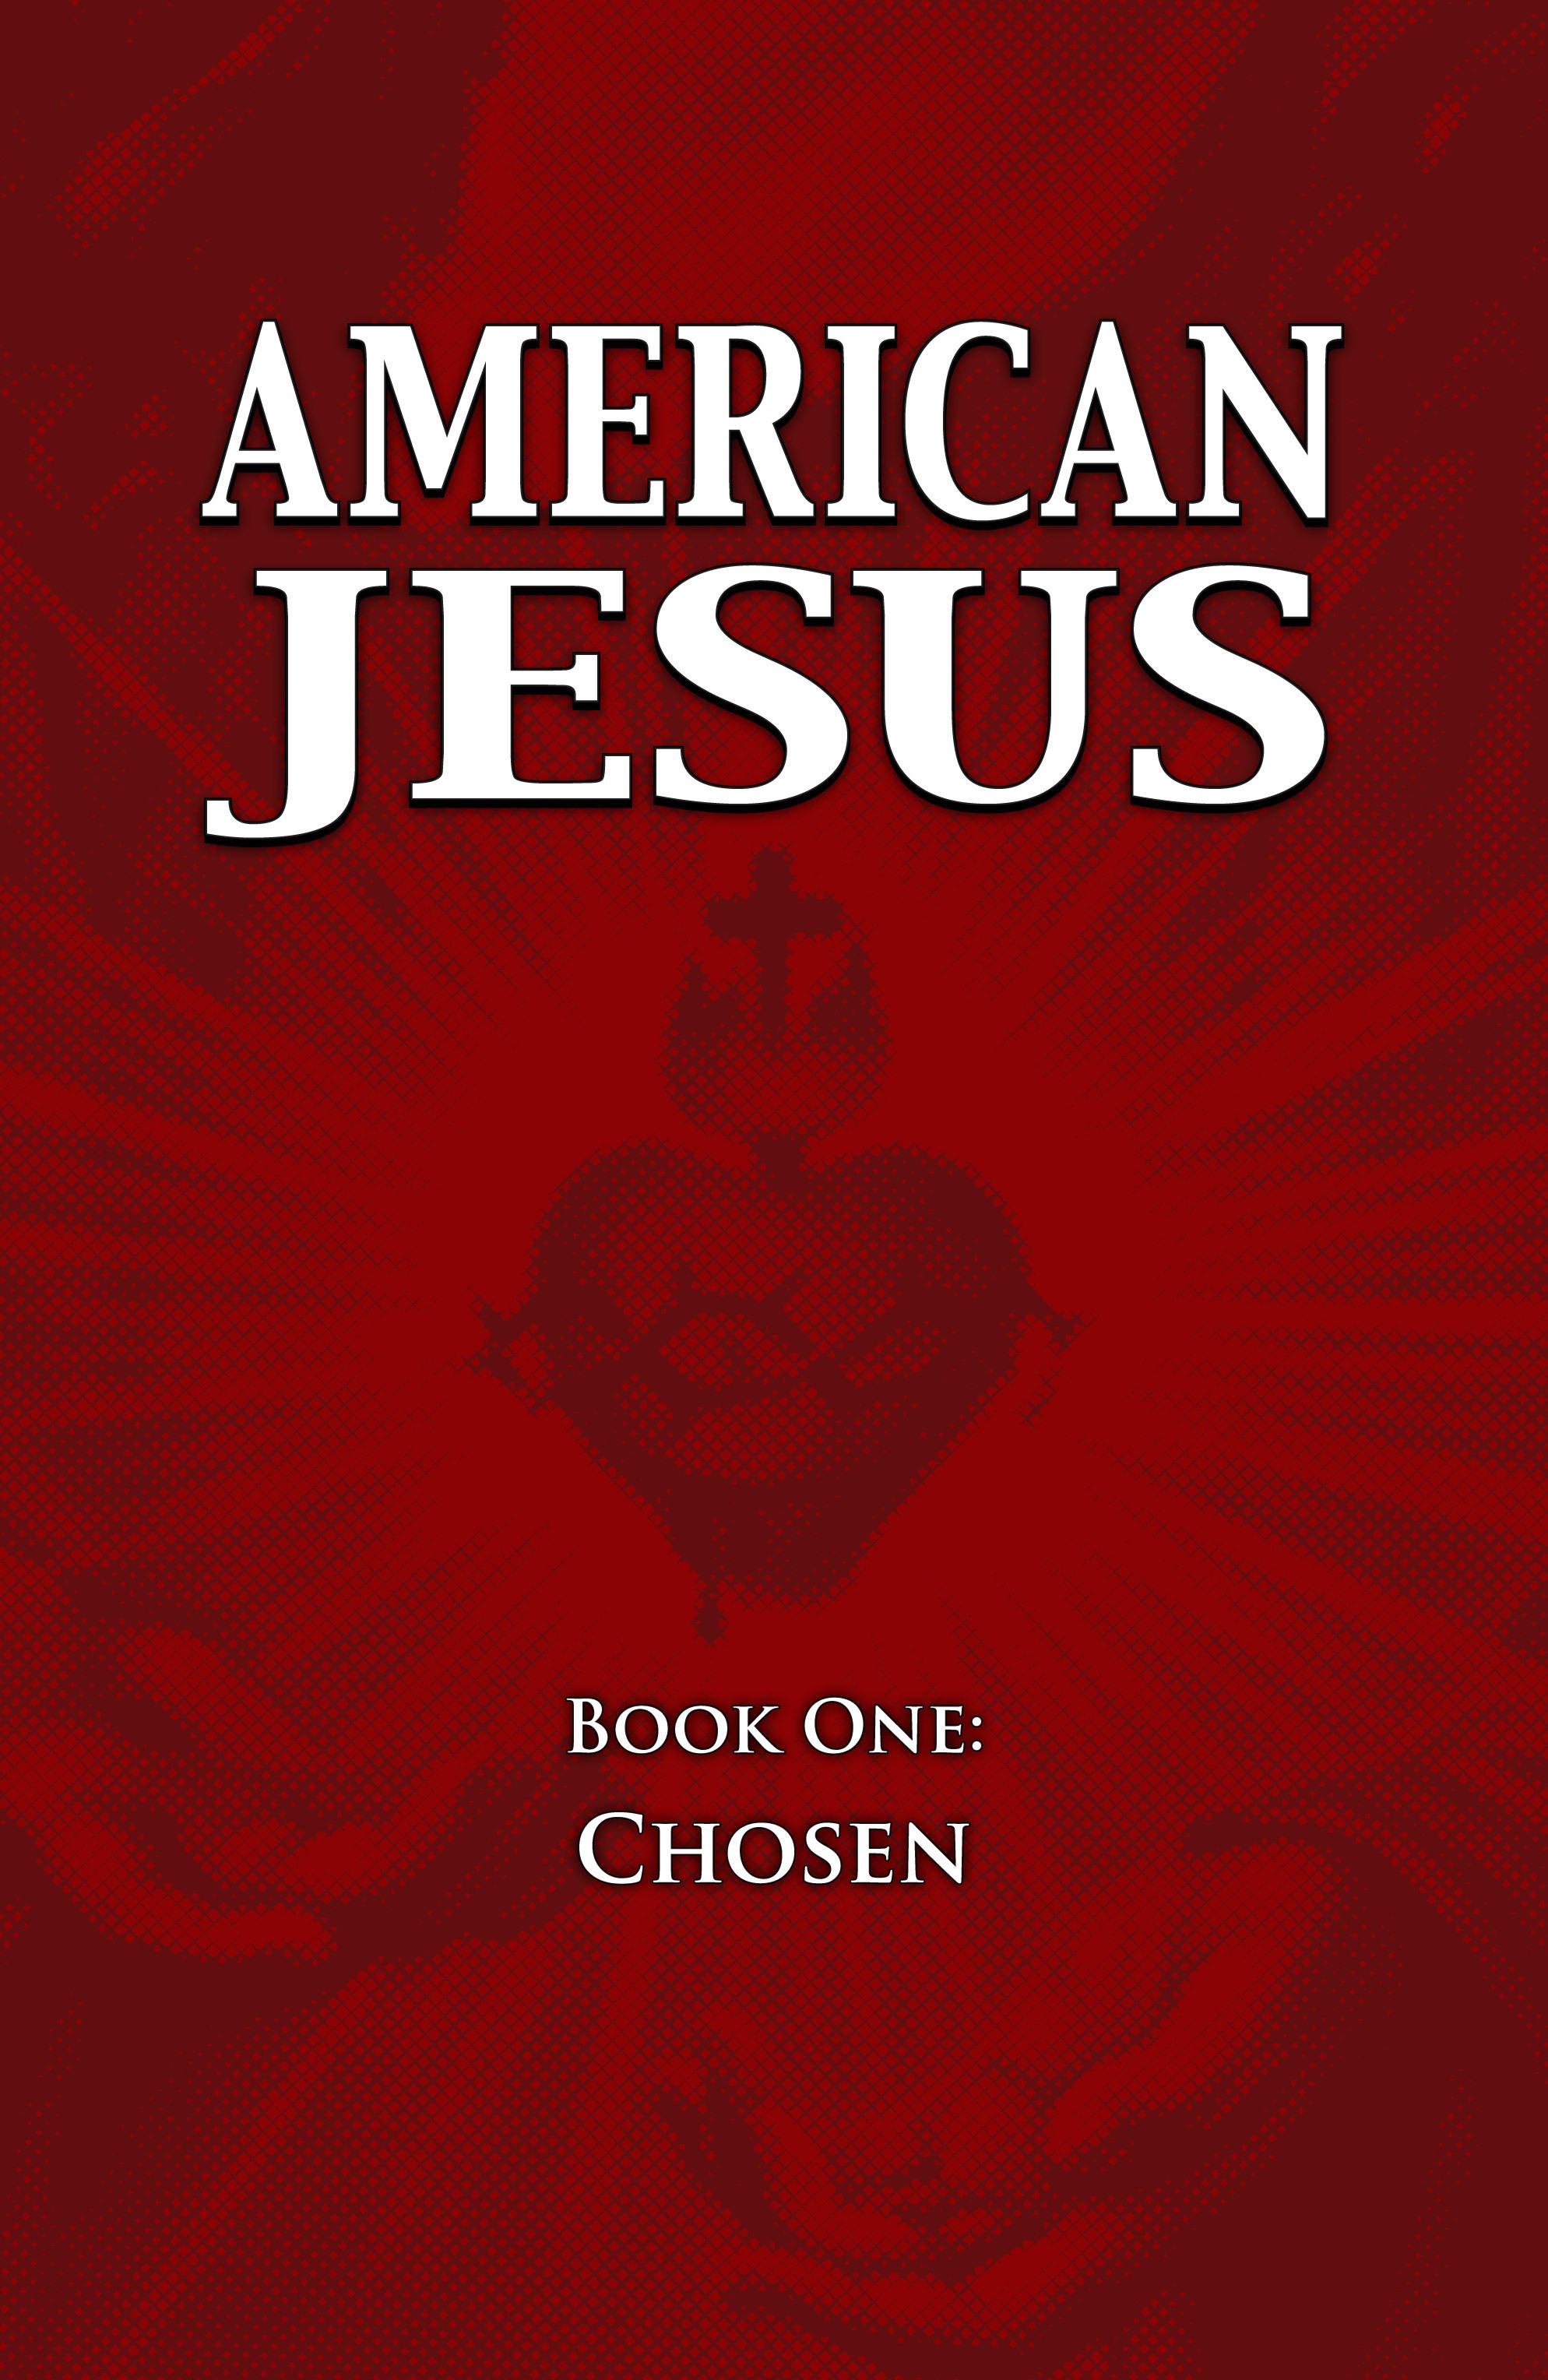 Read online American Jesus comic -  Issue # TPB - 3